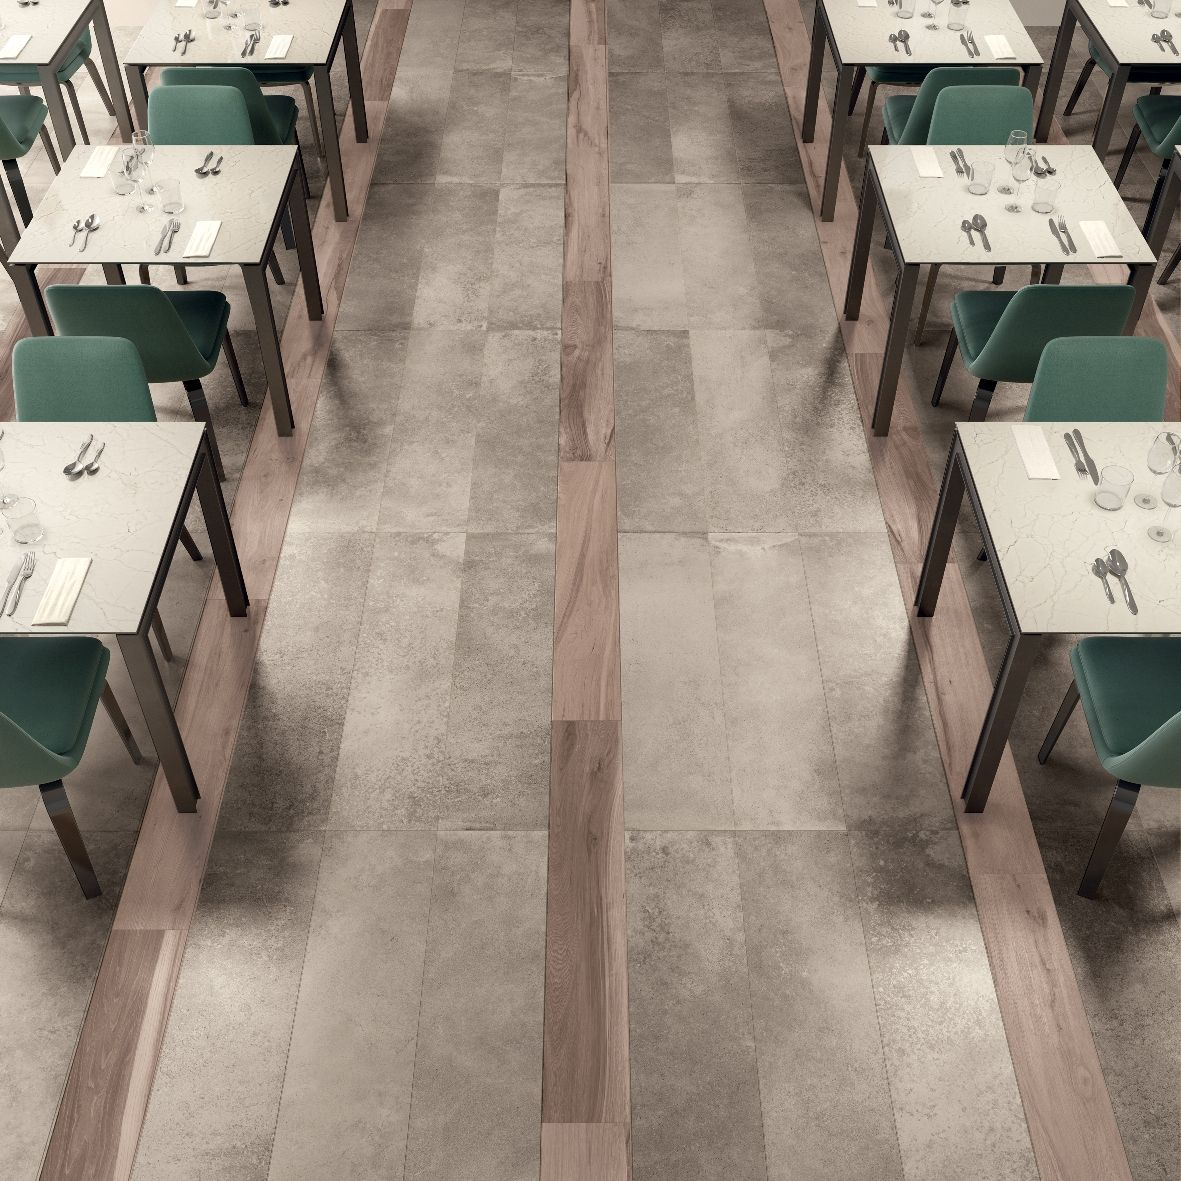 Floor crossover abkemozioni unika ecru soleras avana ceramic floor crossover abkemozioni unika ecru soleras avana ceramic tiles dailygadgetfo Choice Image